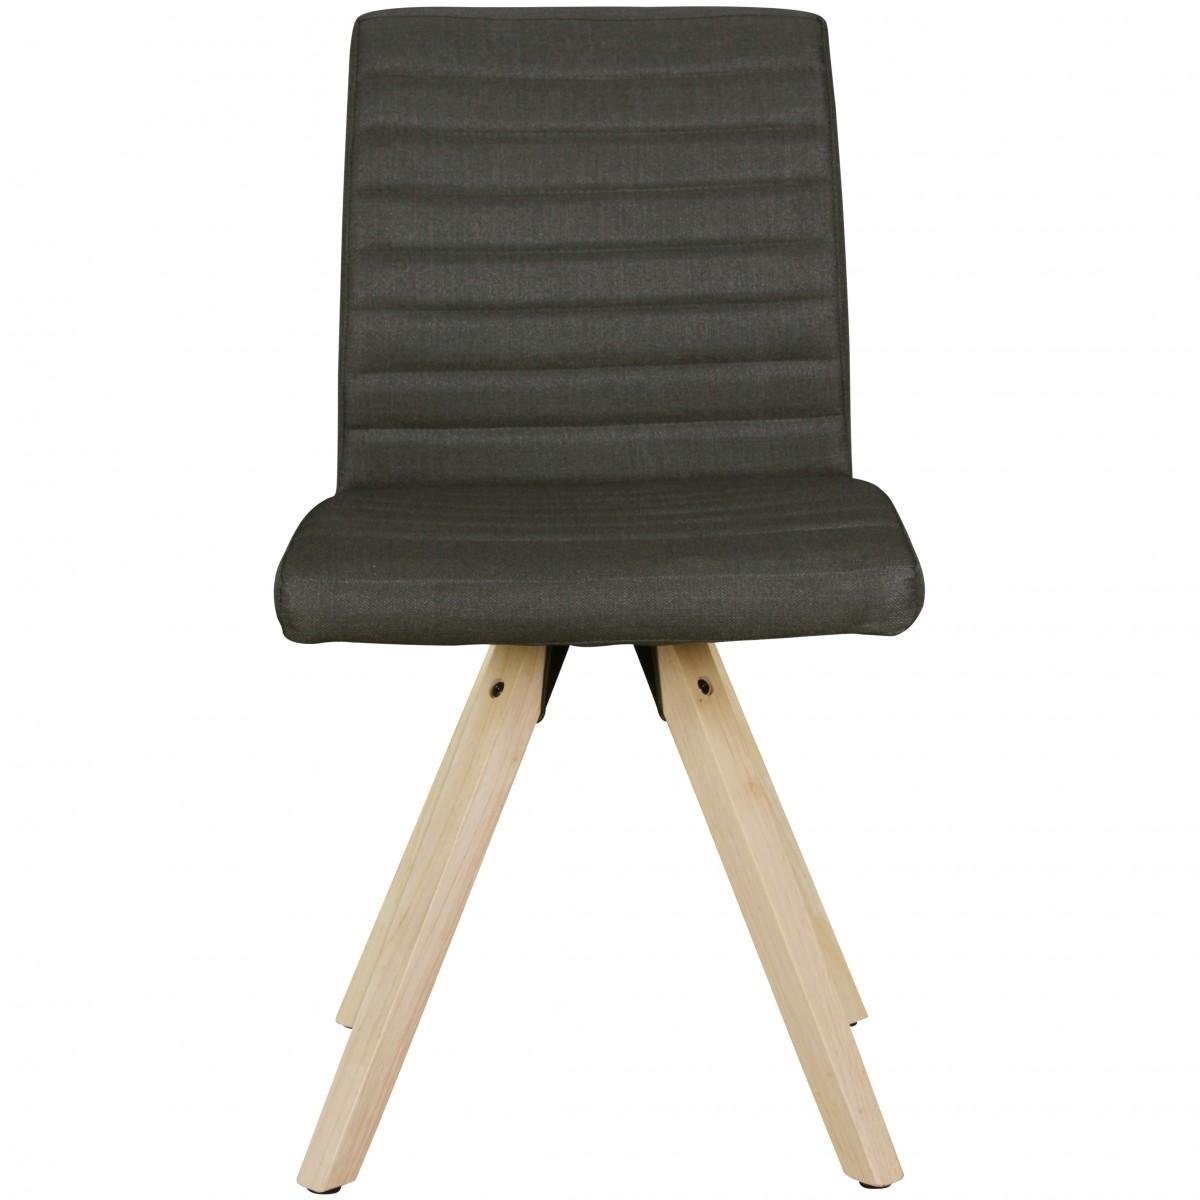 finebuy 2er set retro esszimmerst hle lund skandinavisches. Black Bedroom Furniture Sets. Home Design Ideas